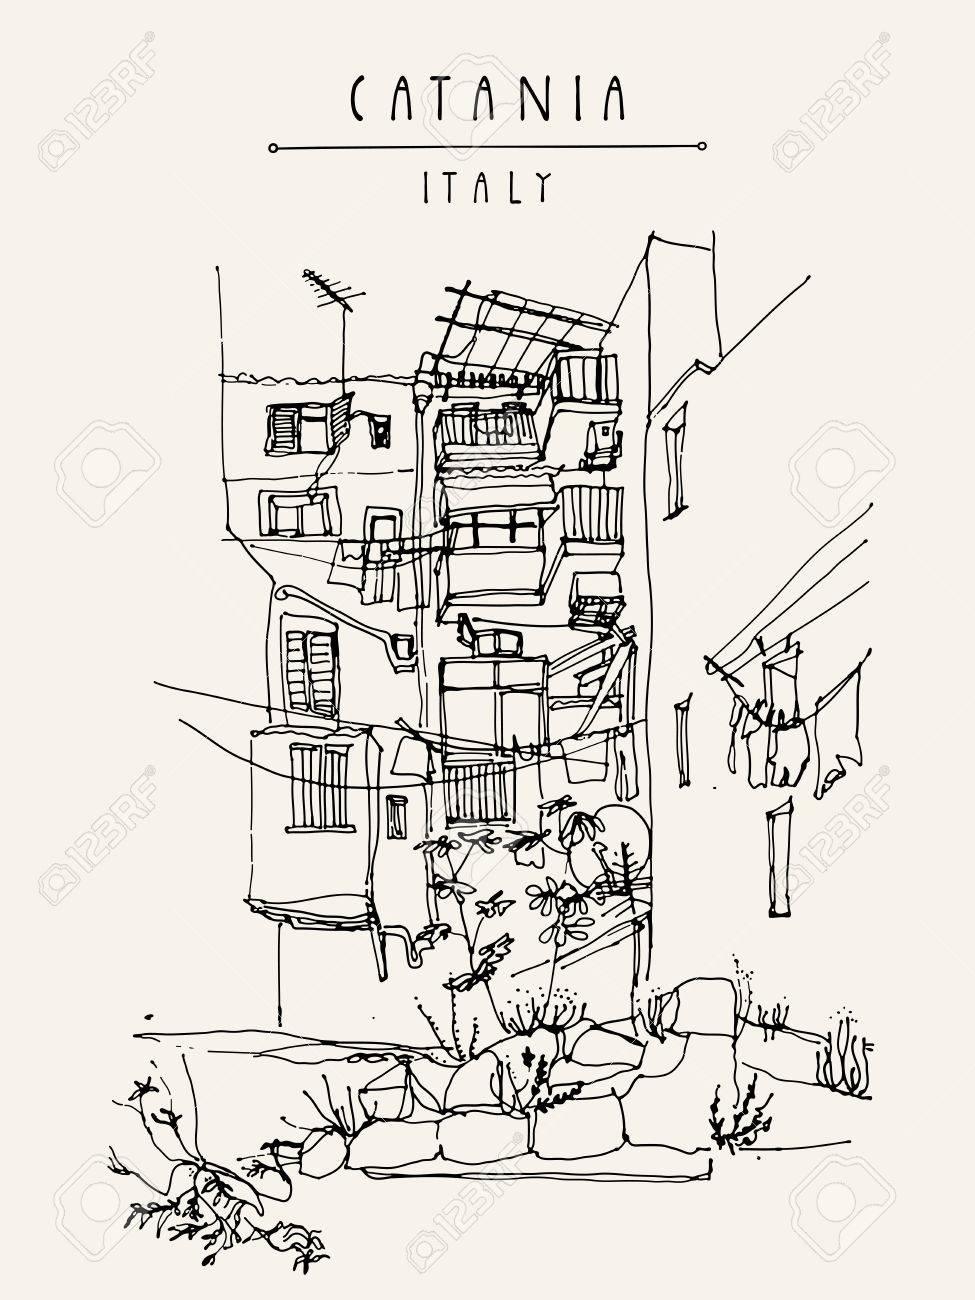 975x1300 Catania, Sicily, Italy. Illustration Of A Backyard With Windows